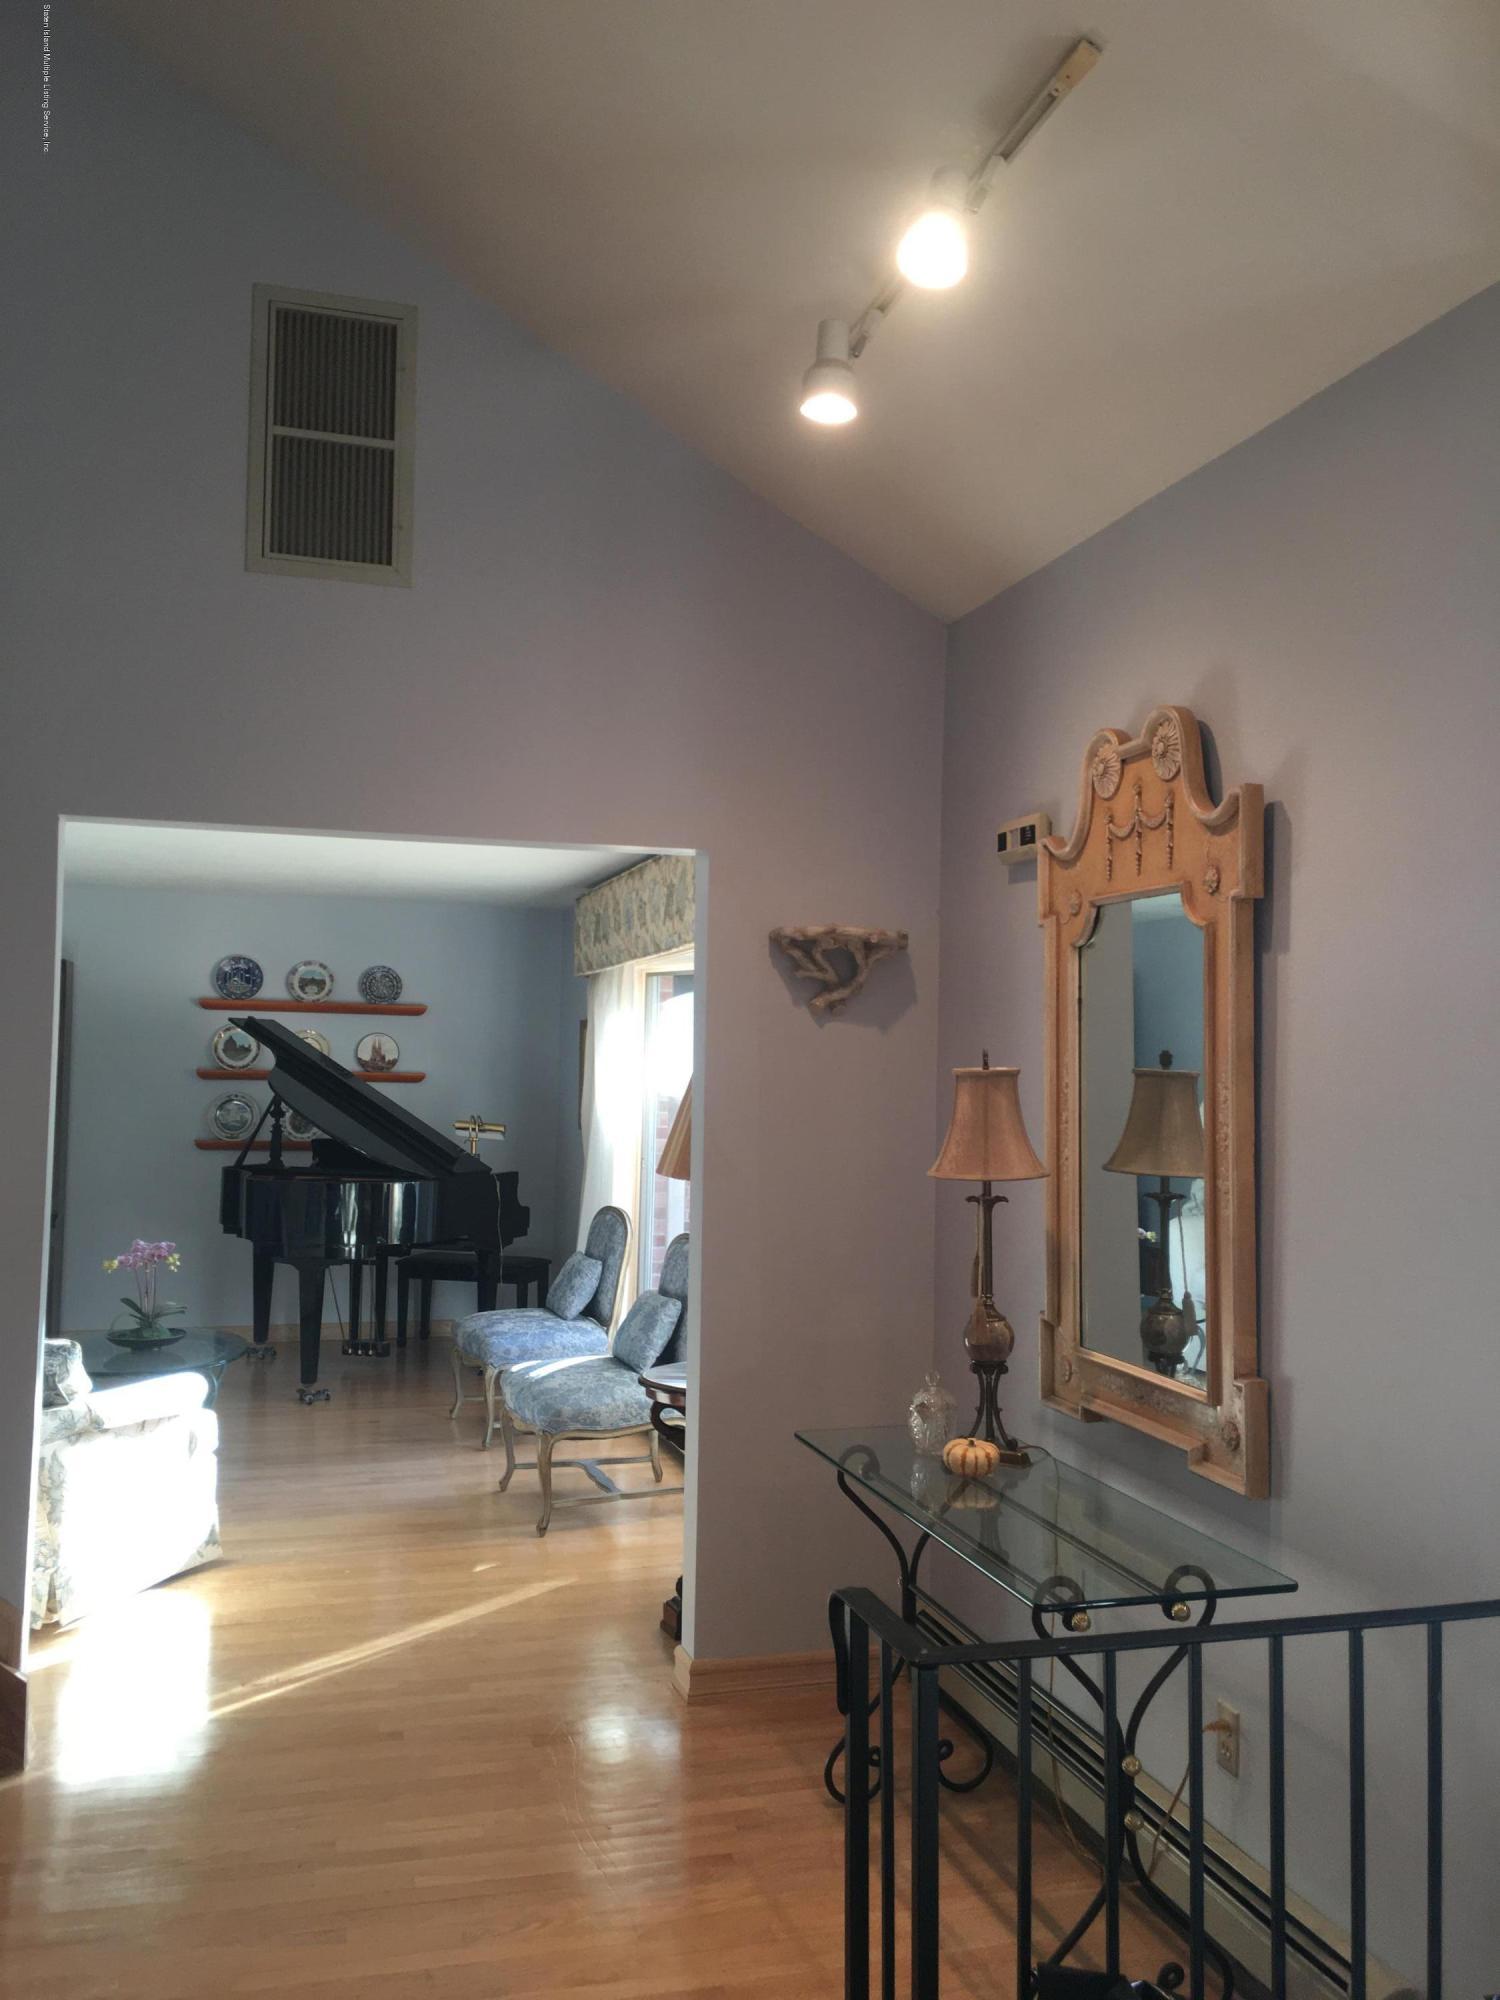 Single Family - Detached 731 Metropolitan Avenue  Staten Island, NY 10301, MLS-1134021-6